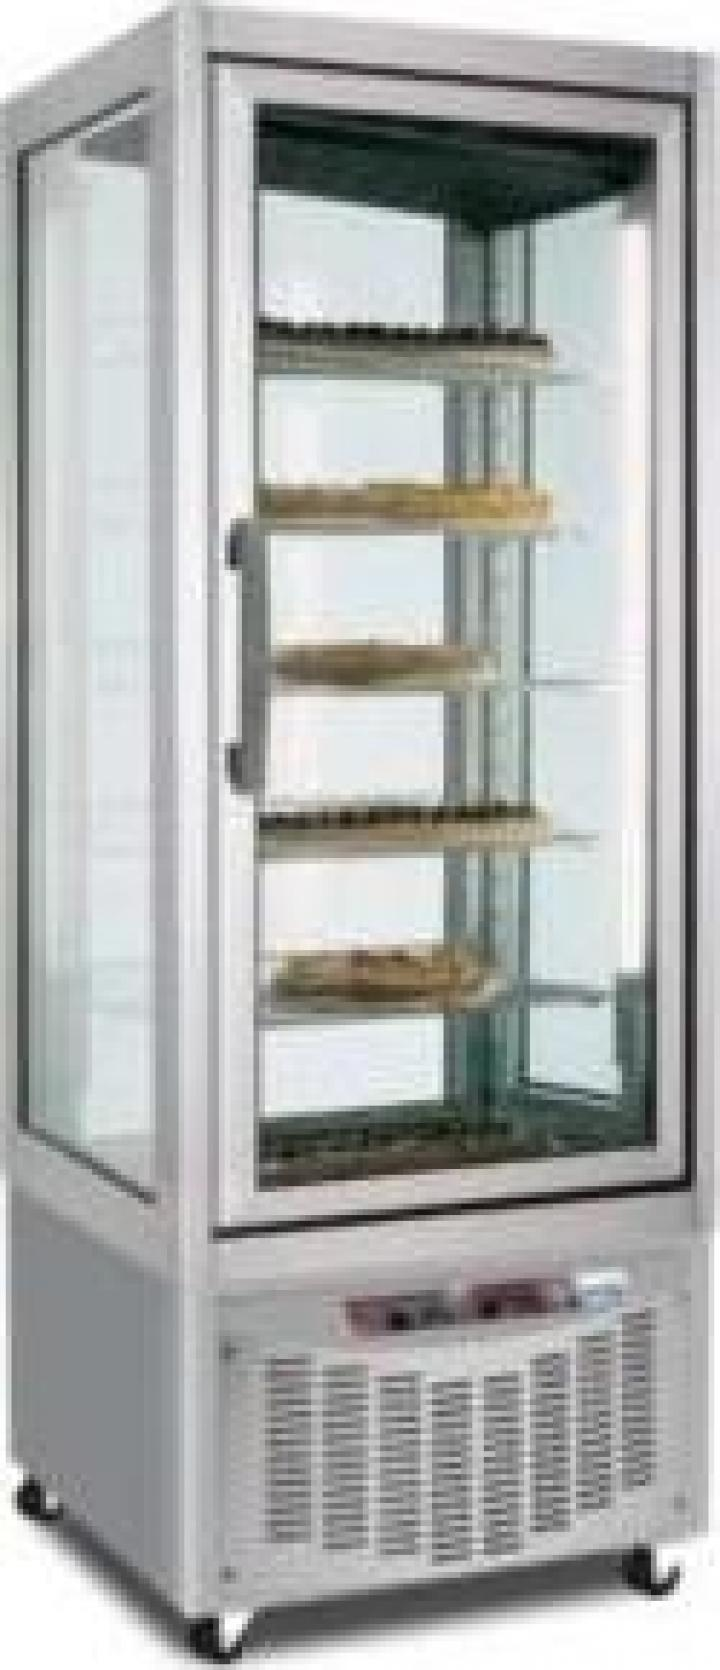 Vitrina verticala cofetarie / gelaterie toate fetele vitrate